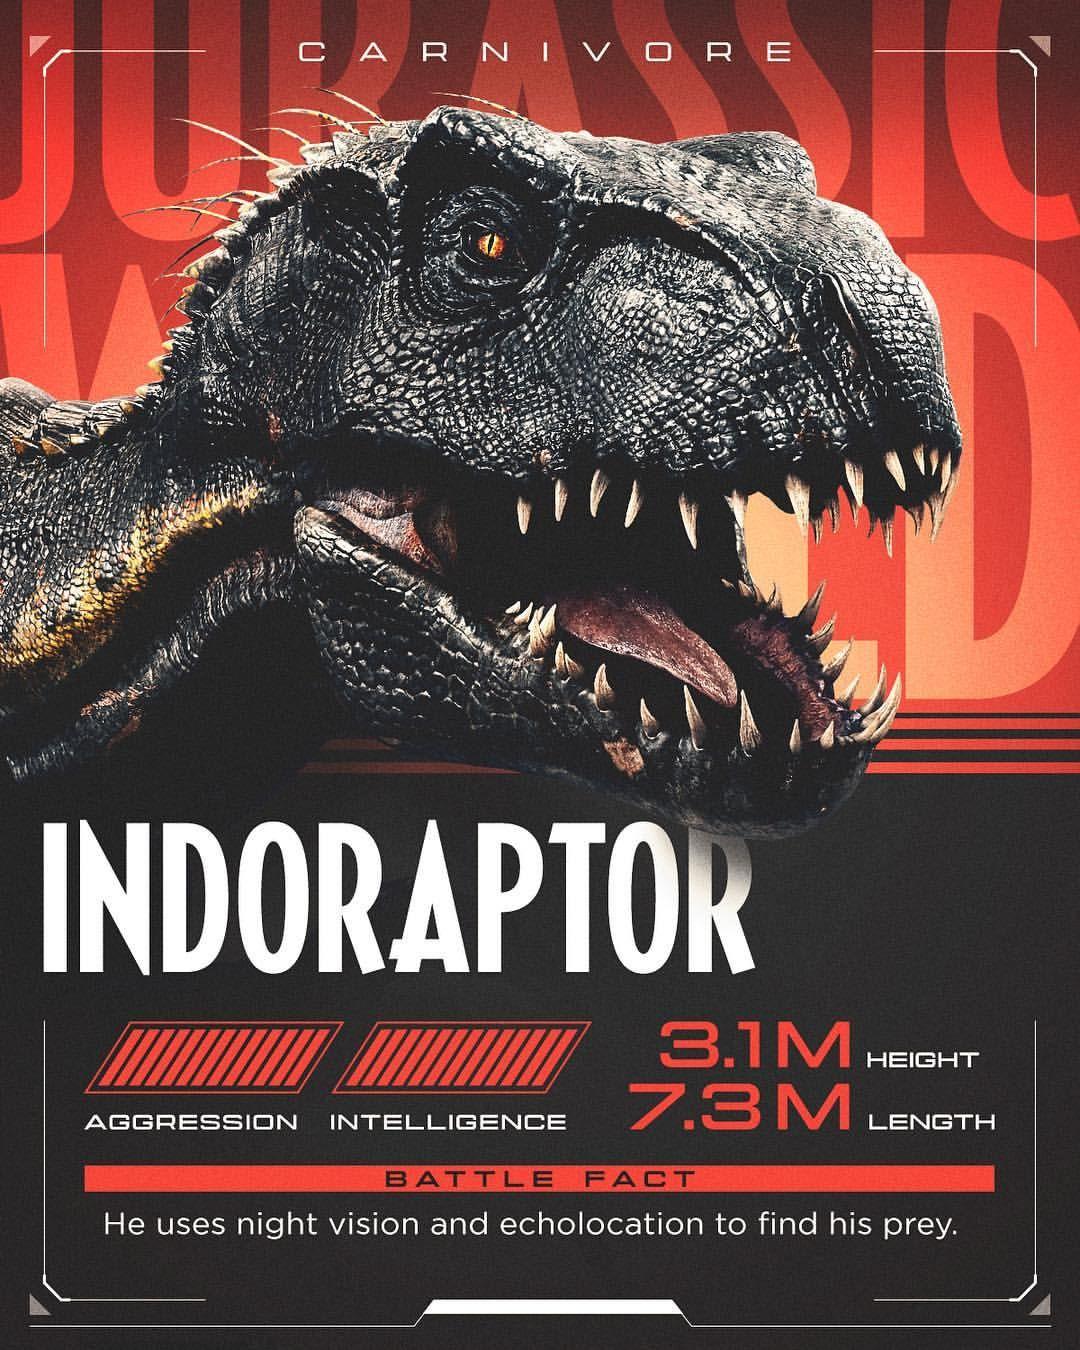 Last roun Jurassic world dinosaurs, Jurassic park movie